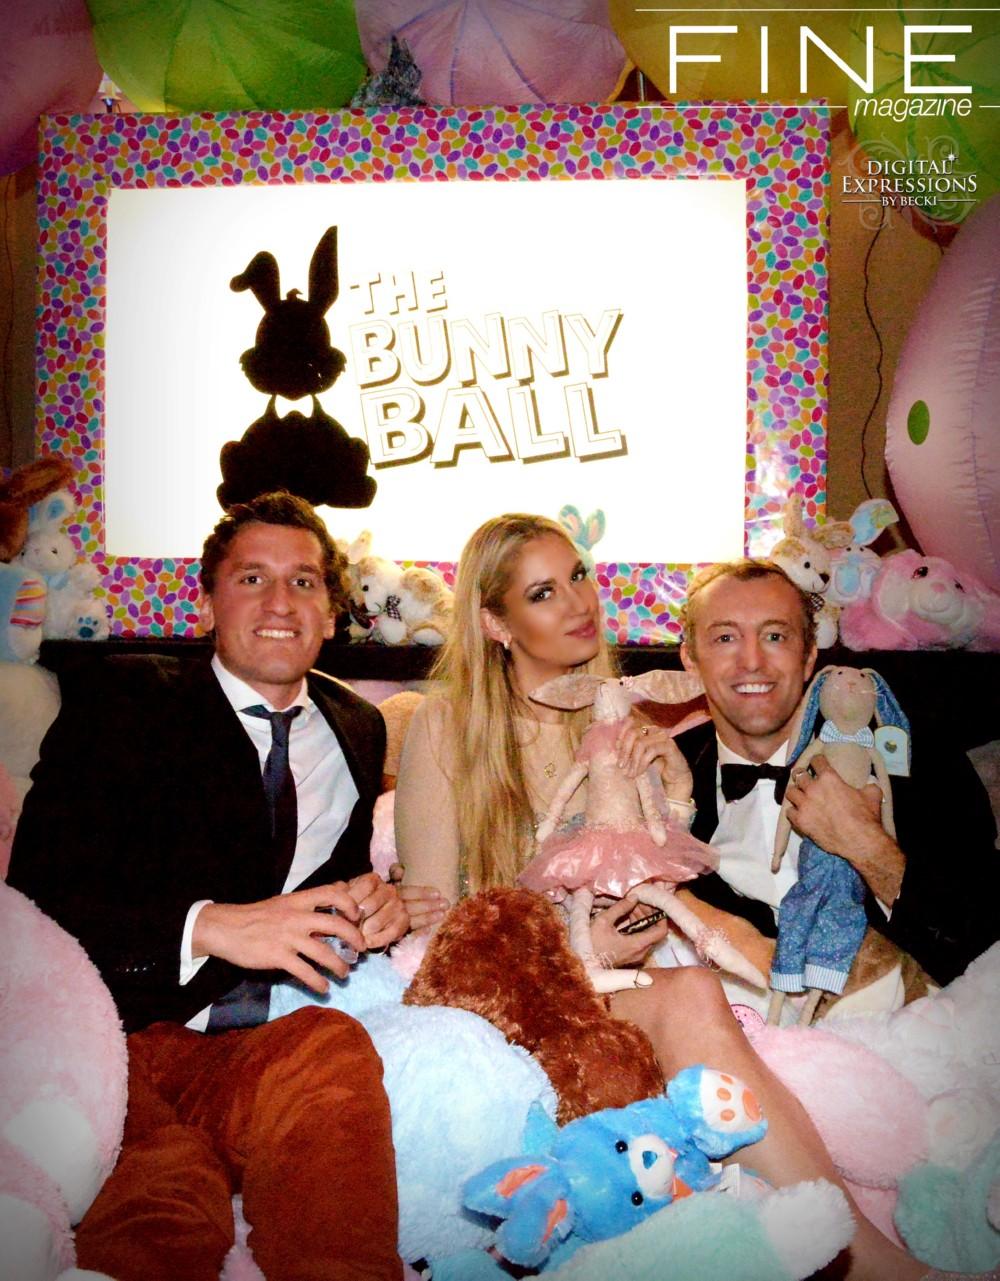 2016 Bunny Ball by FINE Magazine - 82.jpg